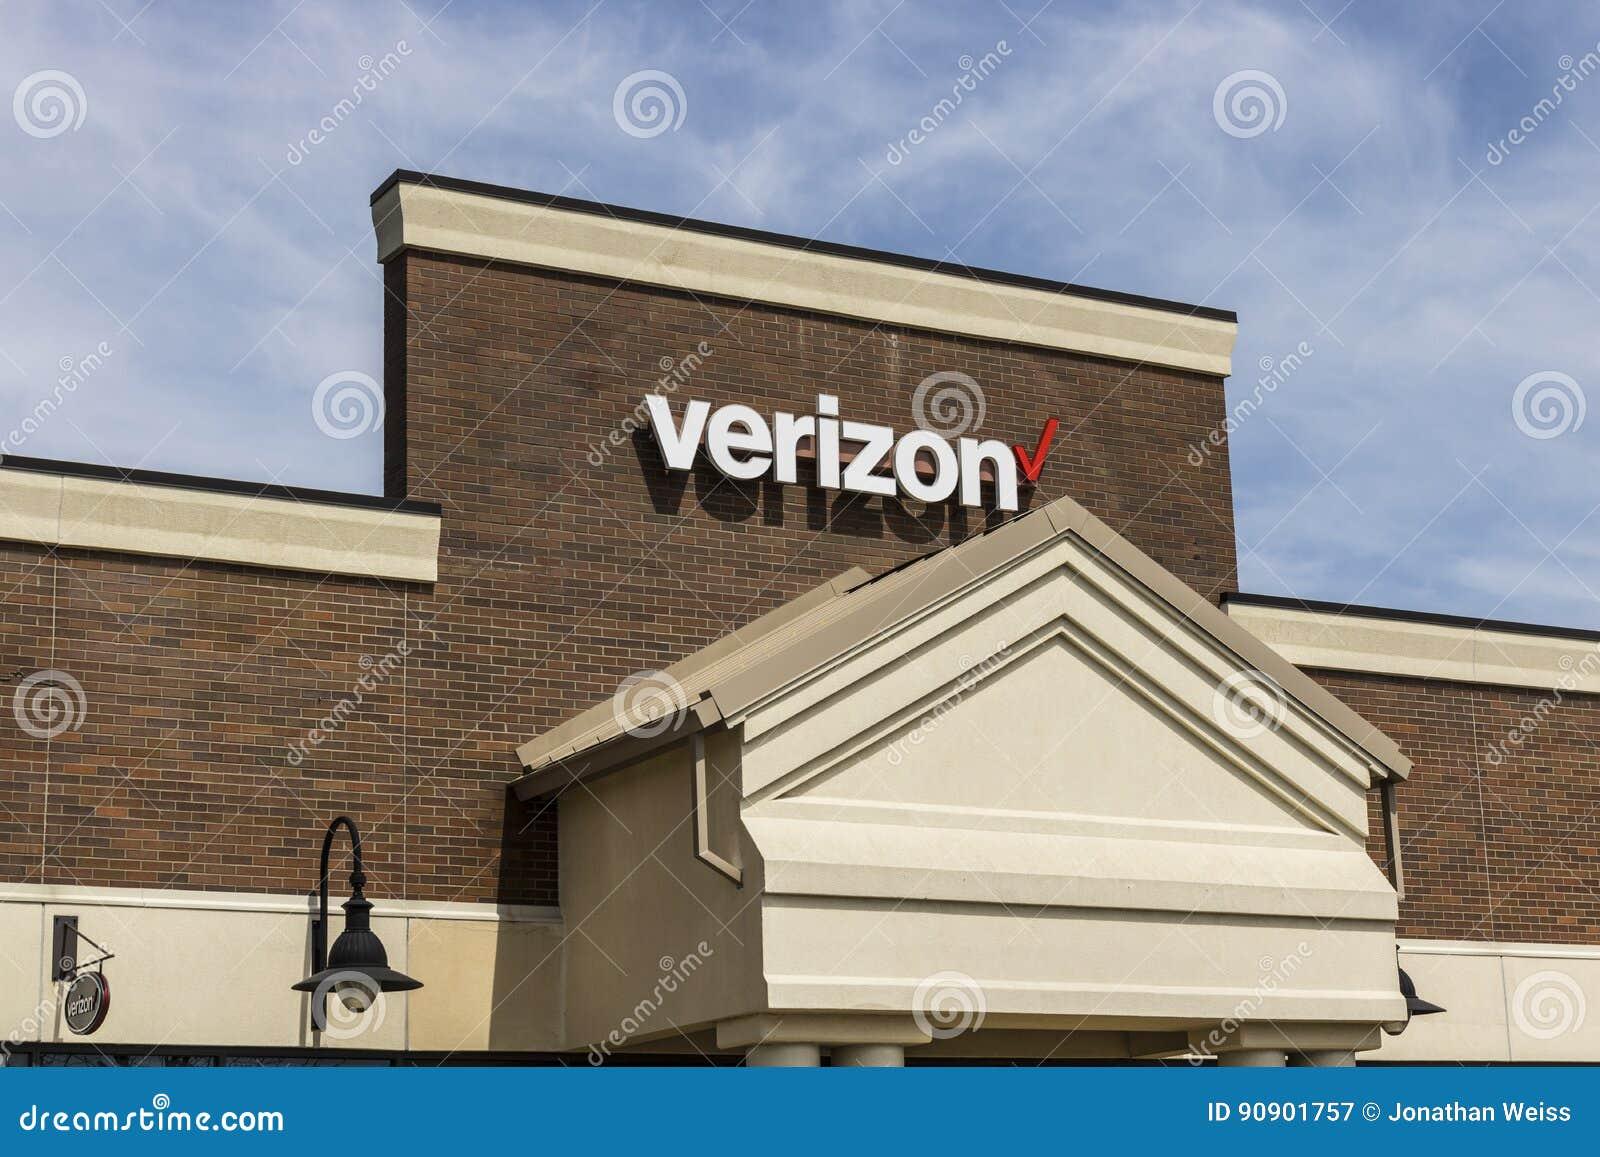 Fort Wayne - Circa April 2017: Verizon Wireless Retail Location. Verizon is One of the Largest Technology Companies XIII